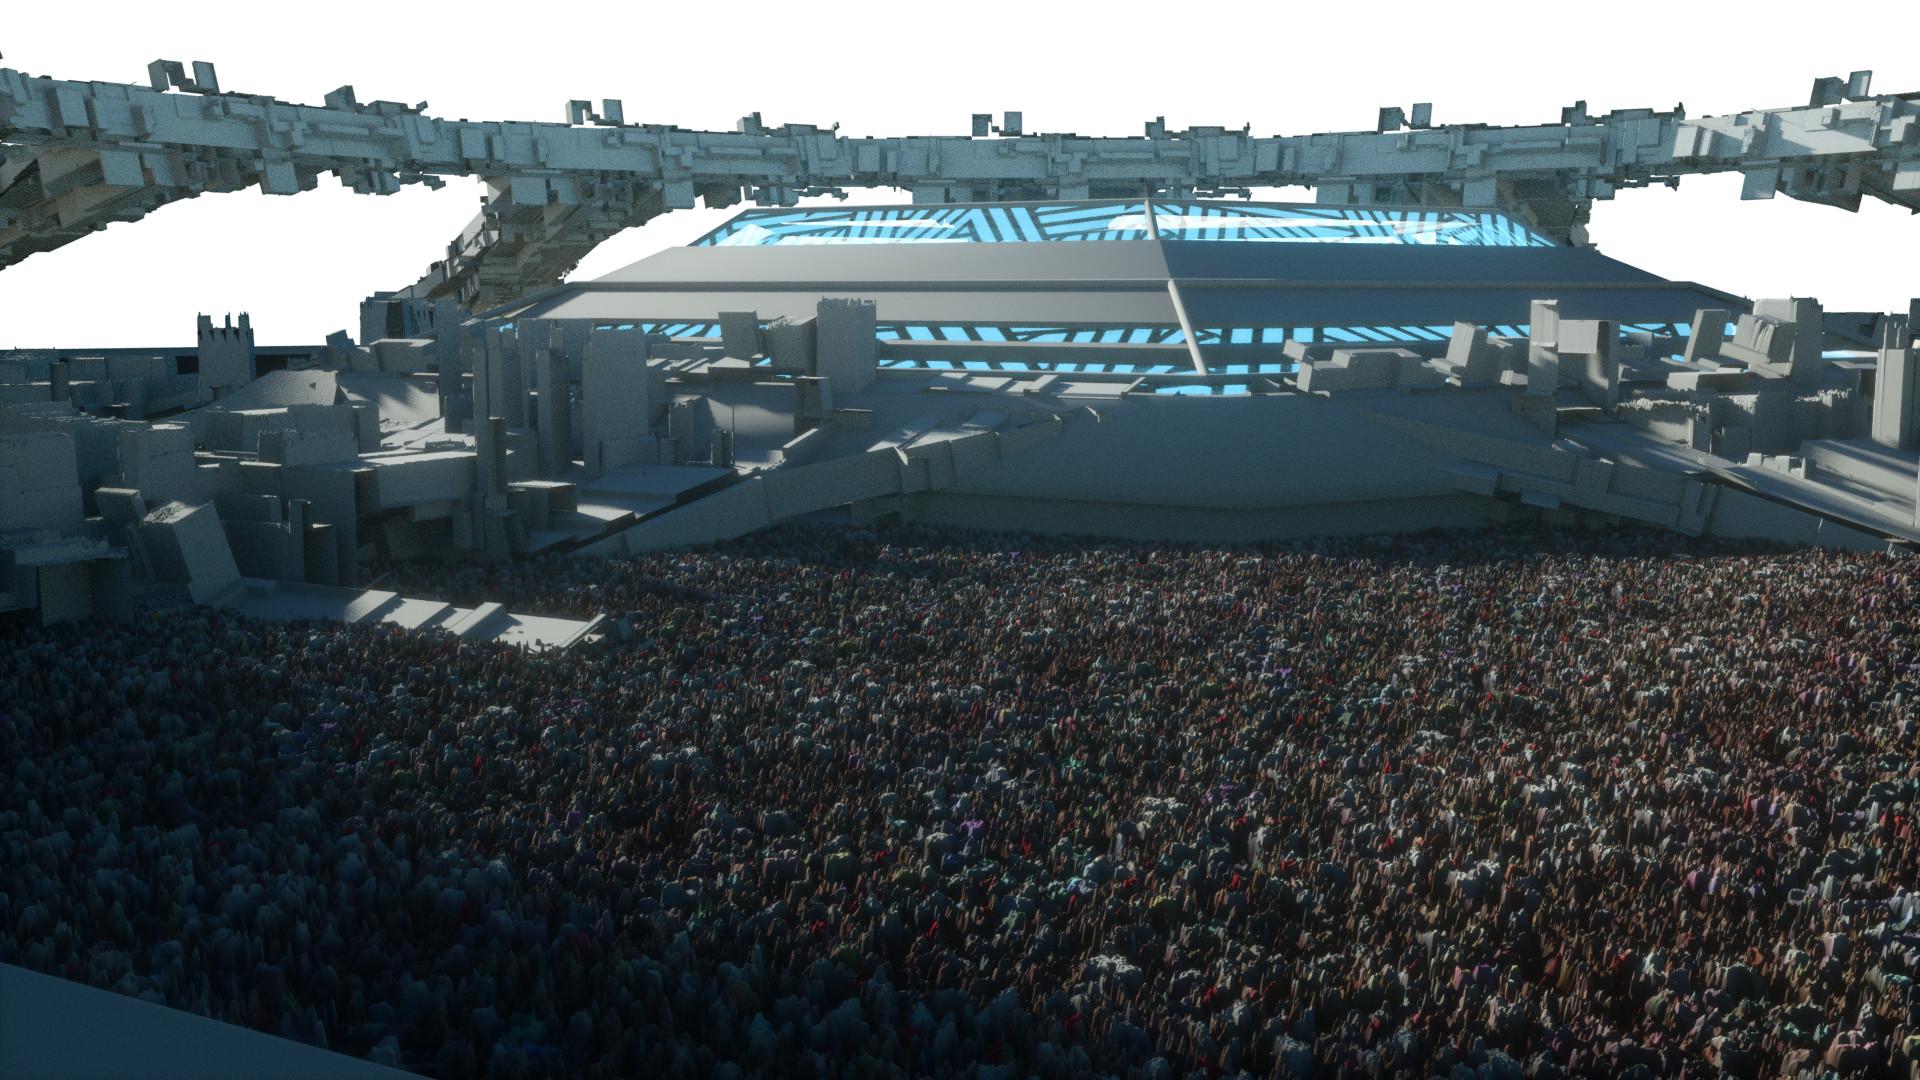 Leon tukker crowd render4